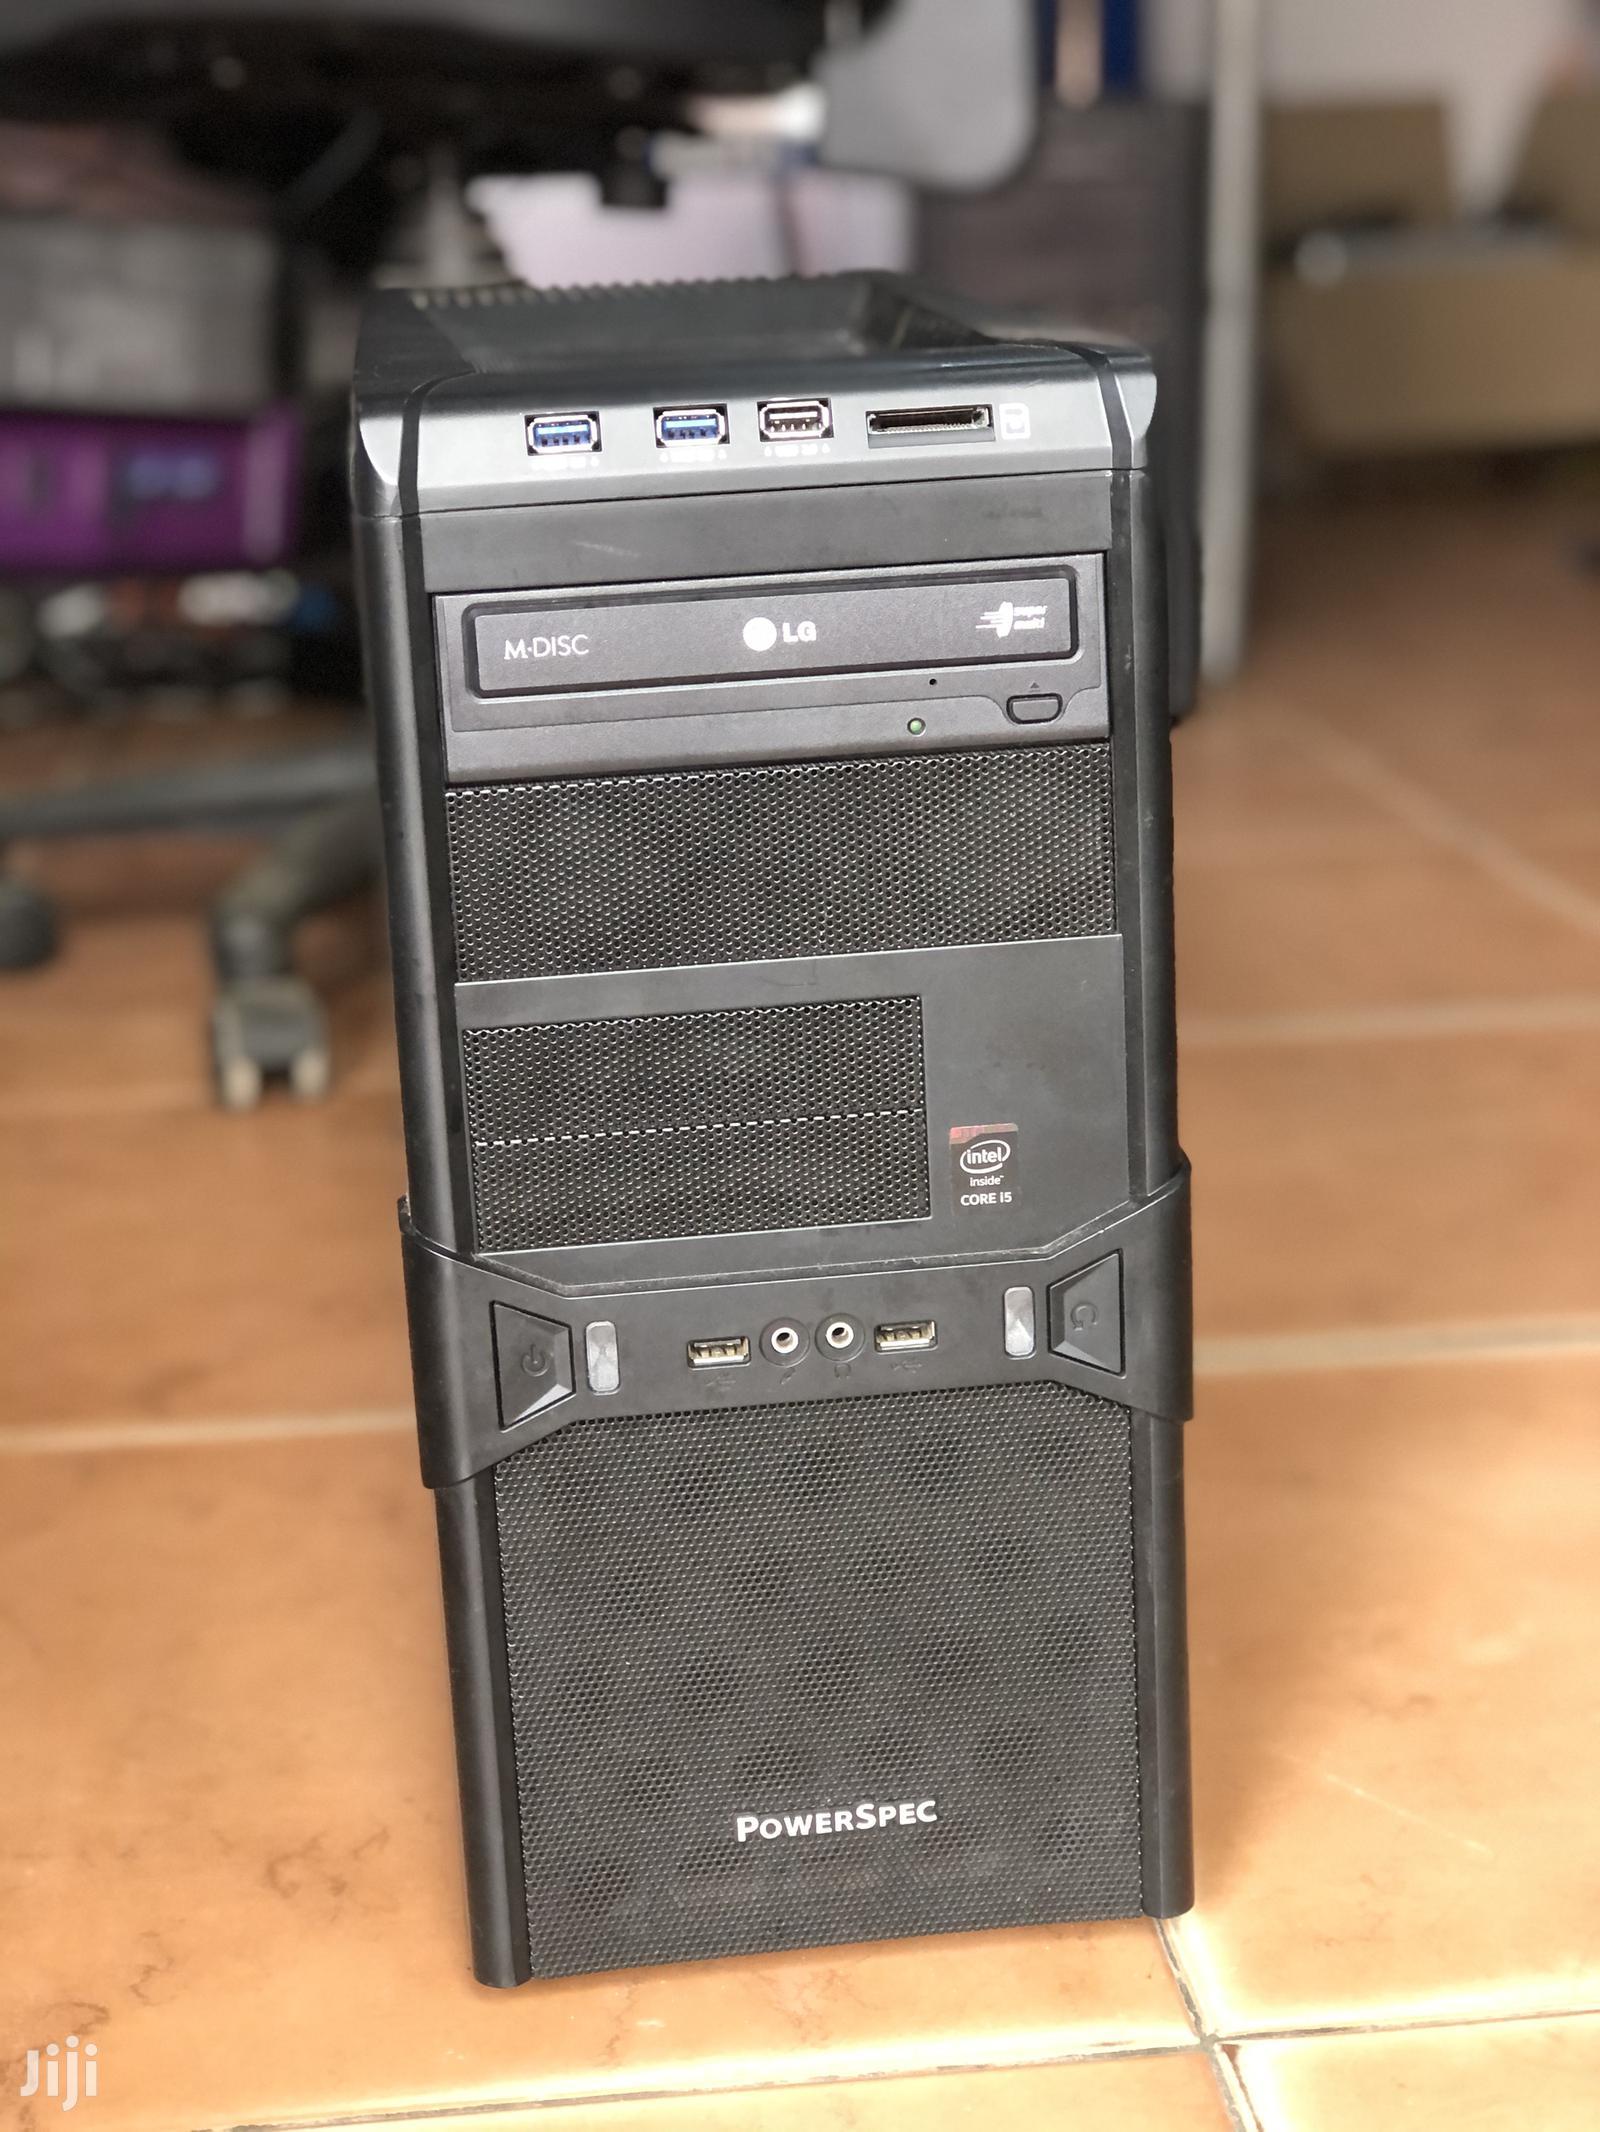 Archive: New Desktop Computer Laptop 8GB Intel Core i5 500GB